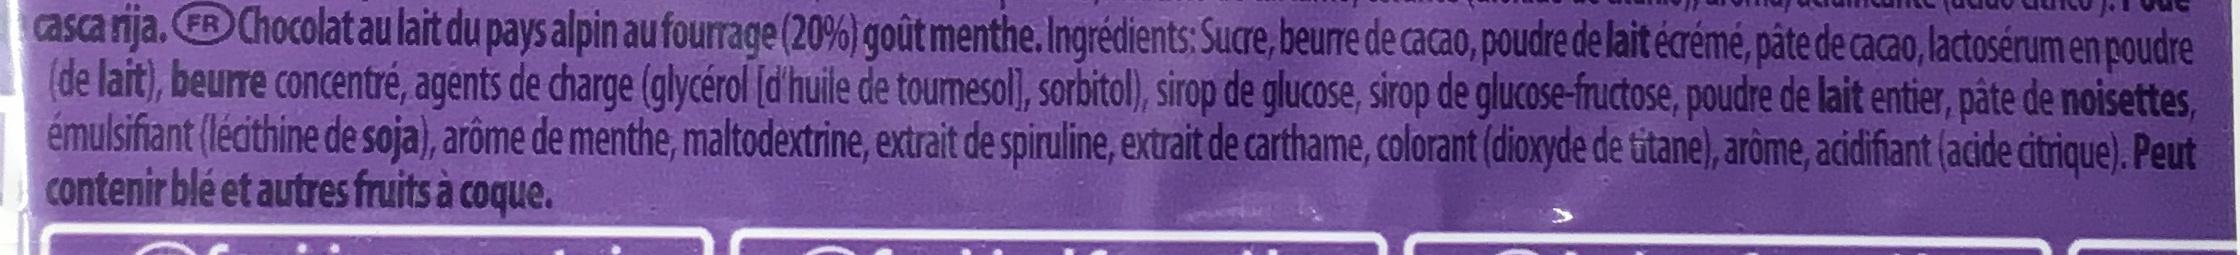 ChoqSplash goût Menthe - Ingrédients - fr